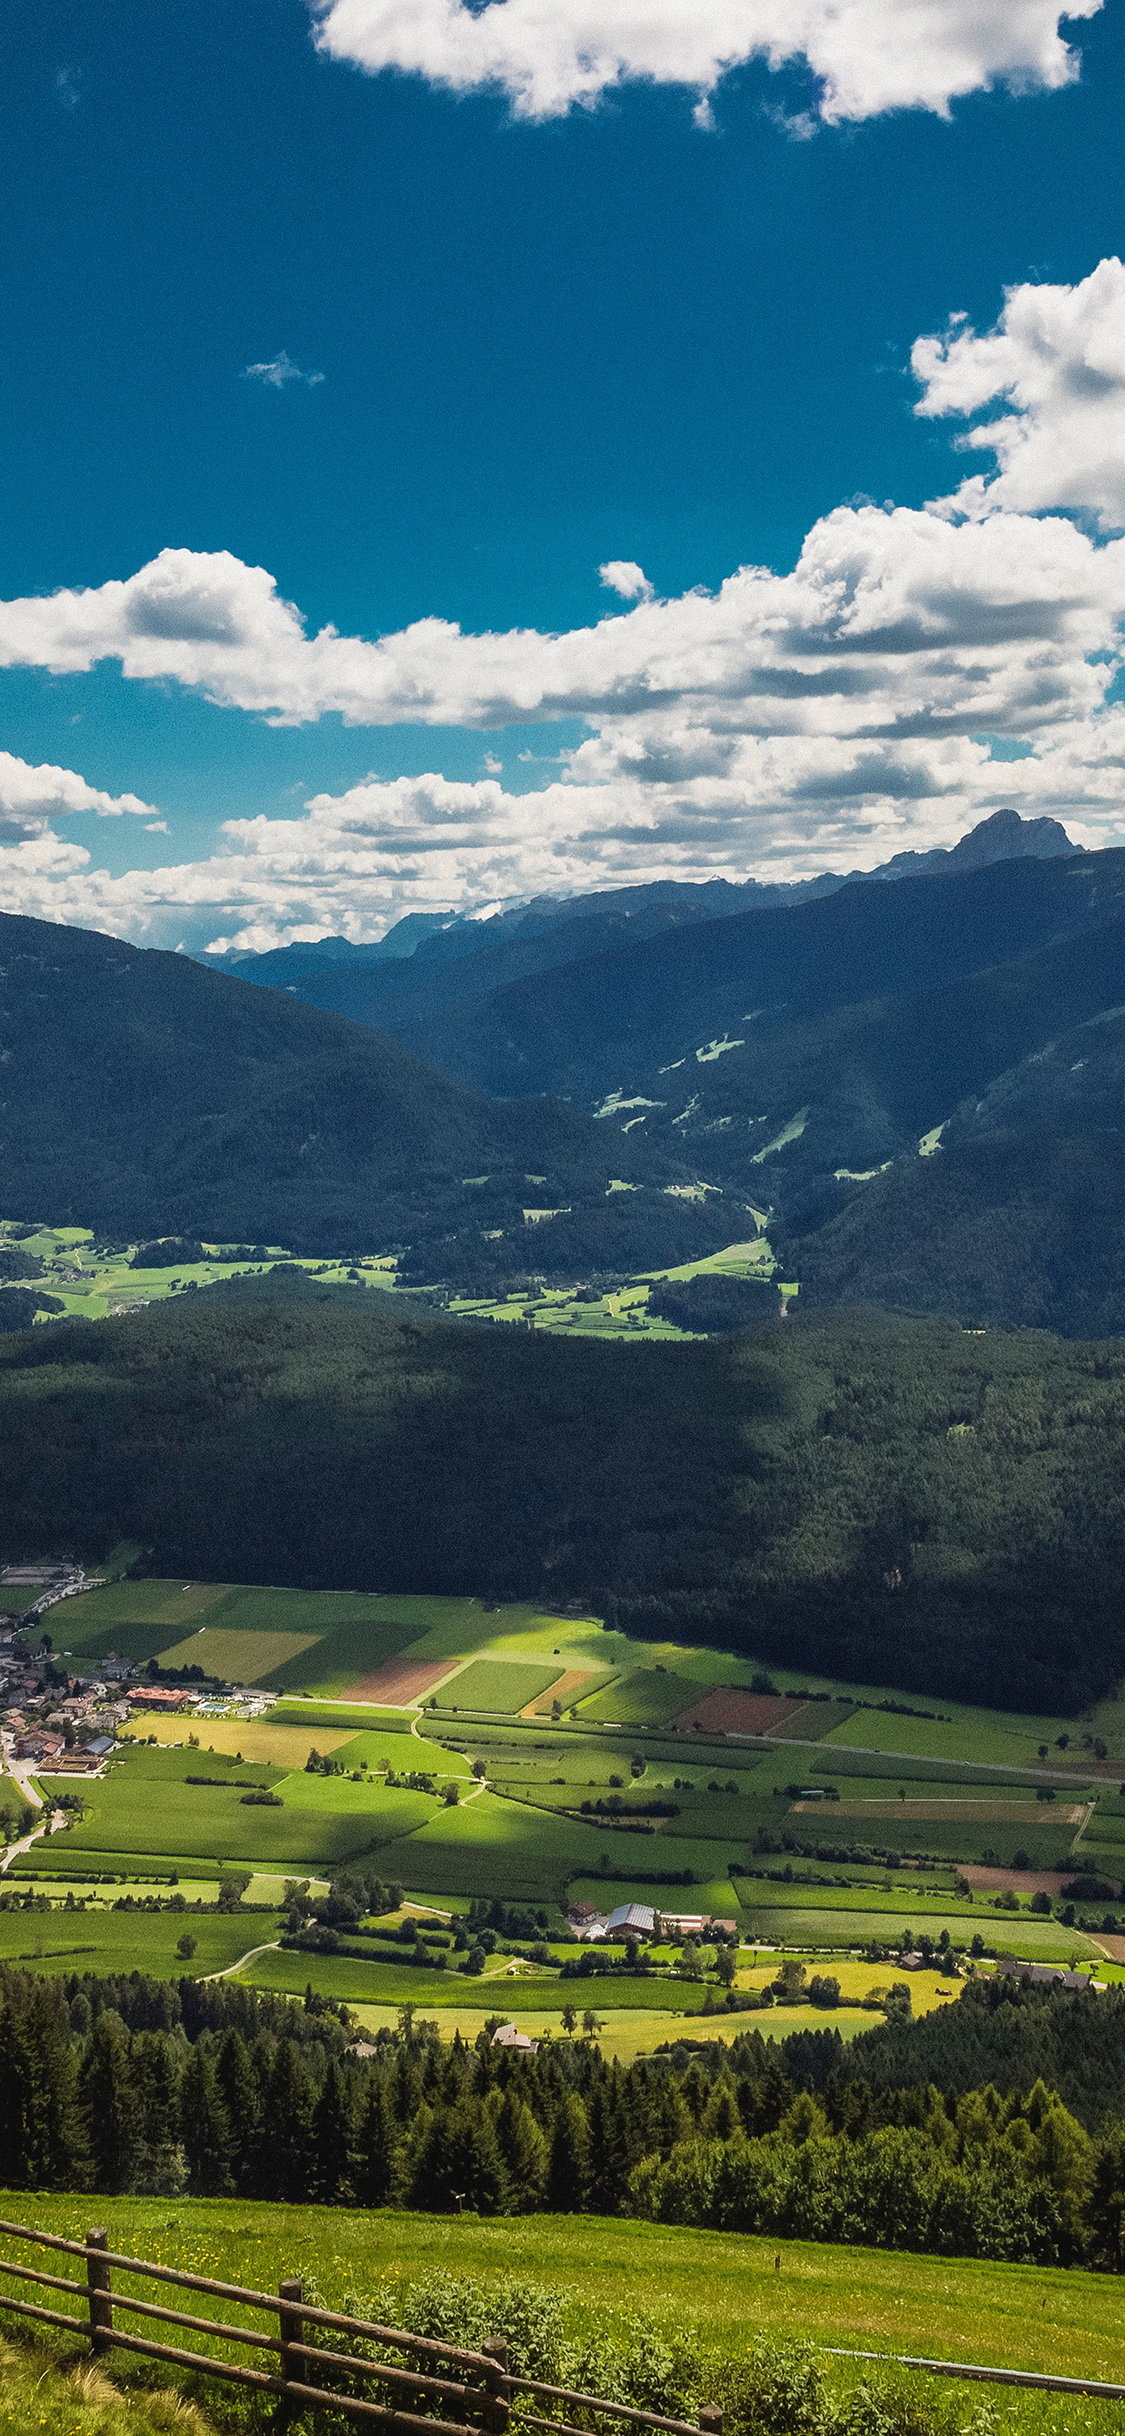 iPhonexpapers.com-Apple-iPhone-wallpaper-ni57-nature-town-sky-cloud-mountain-green-summer